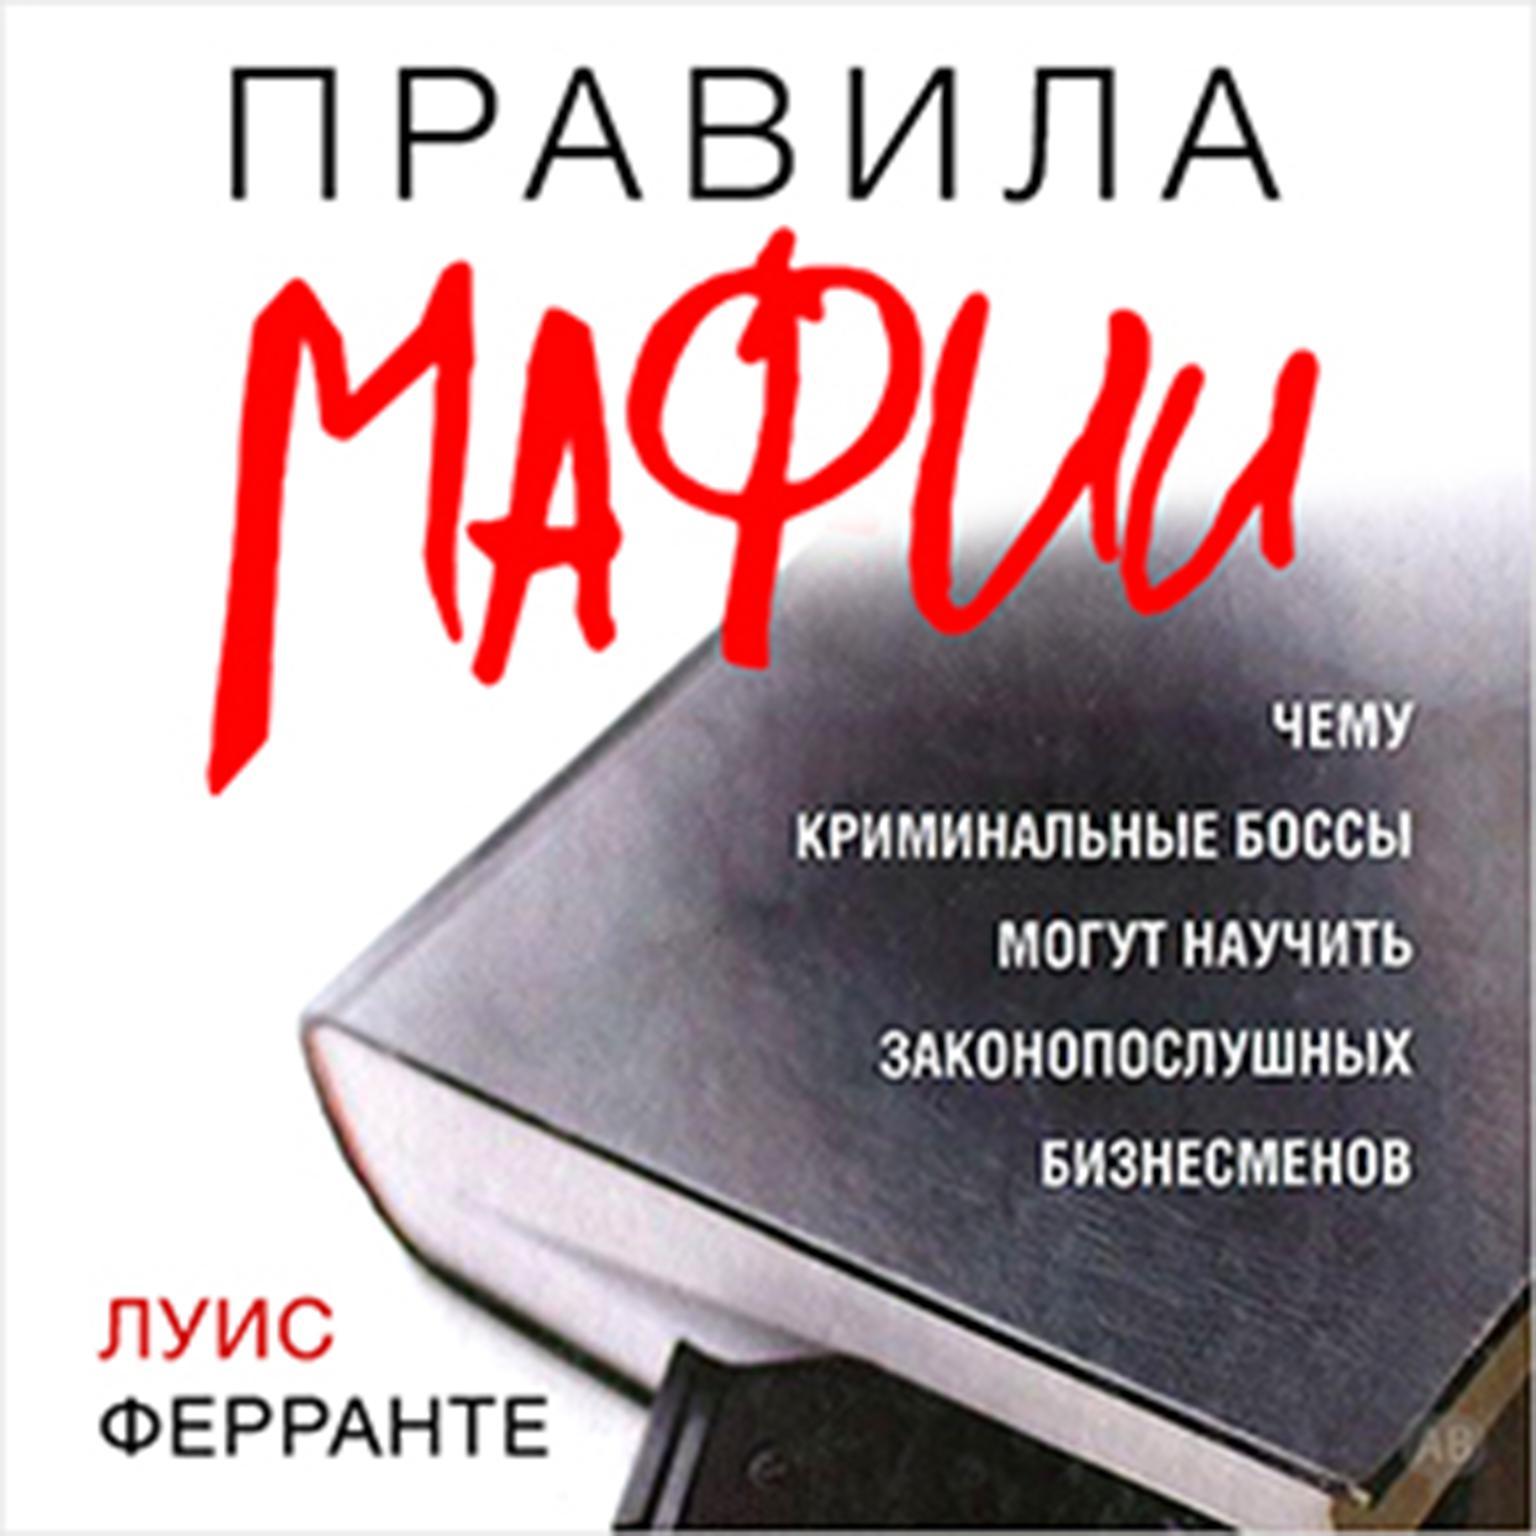 Mob Rules: What the Mafia Can Teach the Legitimate Businessman Audiobook, by Louis Ferrante